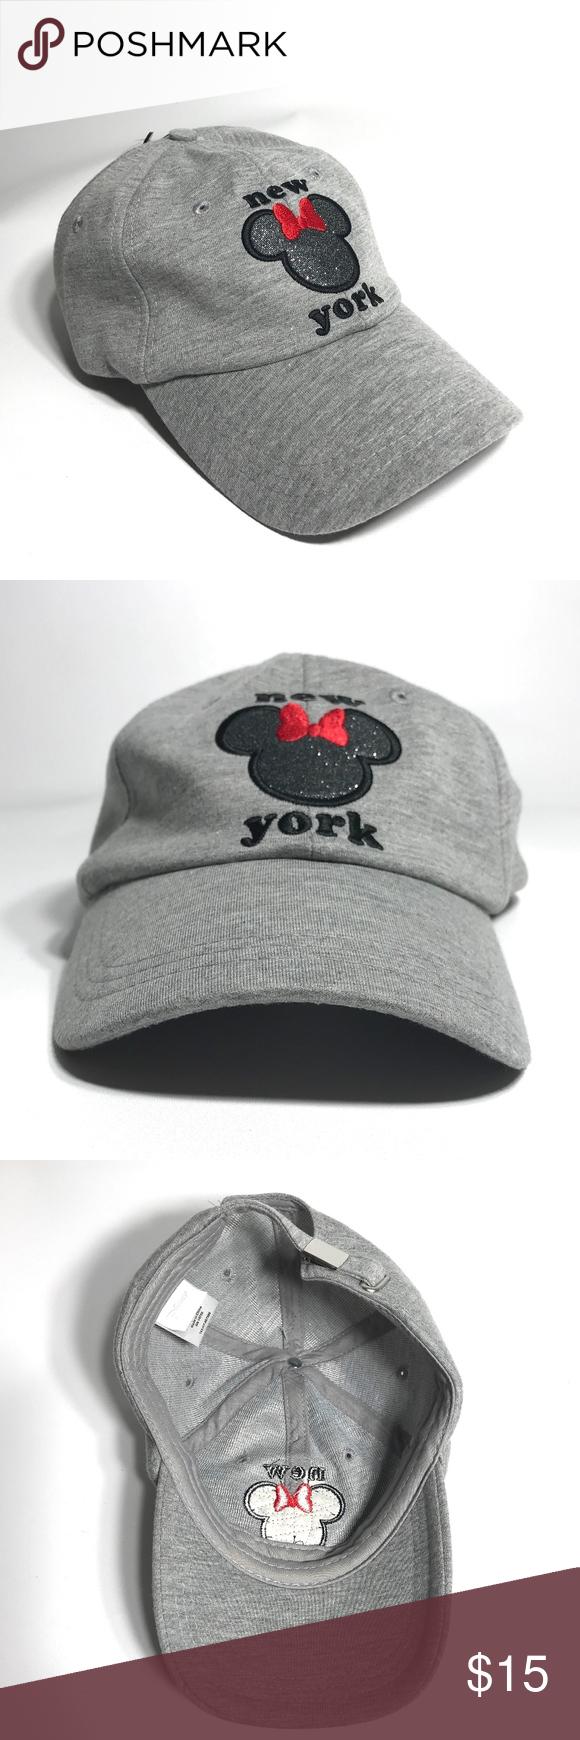 Disney Minnie Mouse Cap Hat for Women Cotton NEW Disney Minnie Mouse New  York Cap Hat Adult size Baseball cap 100% Cotton Color  Gray Adjustable  backstrap ... 957bad565054